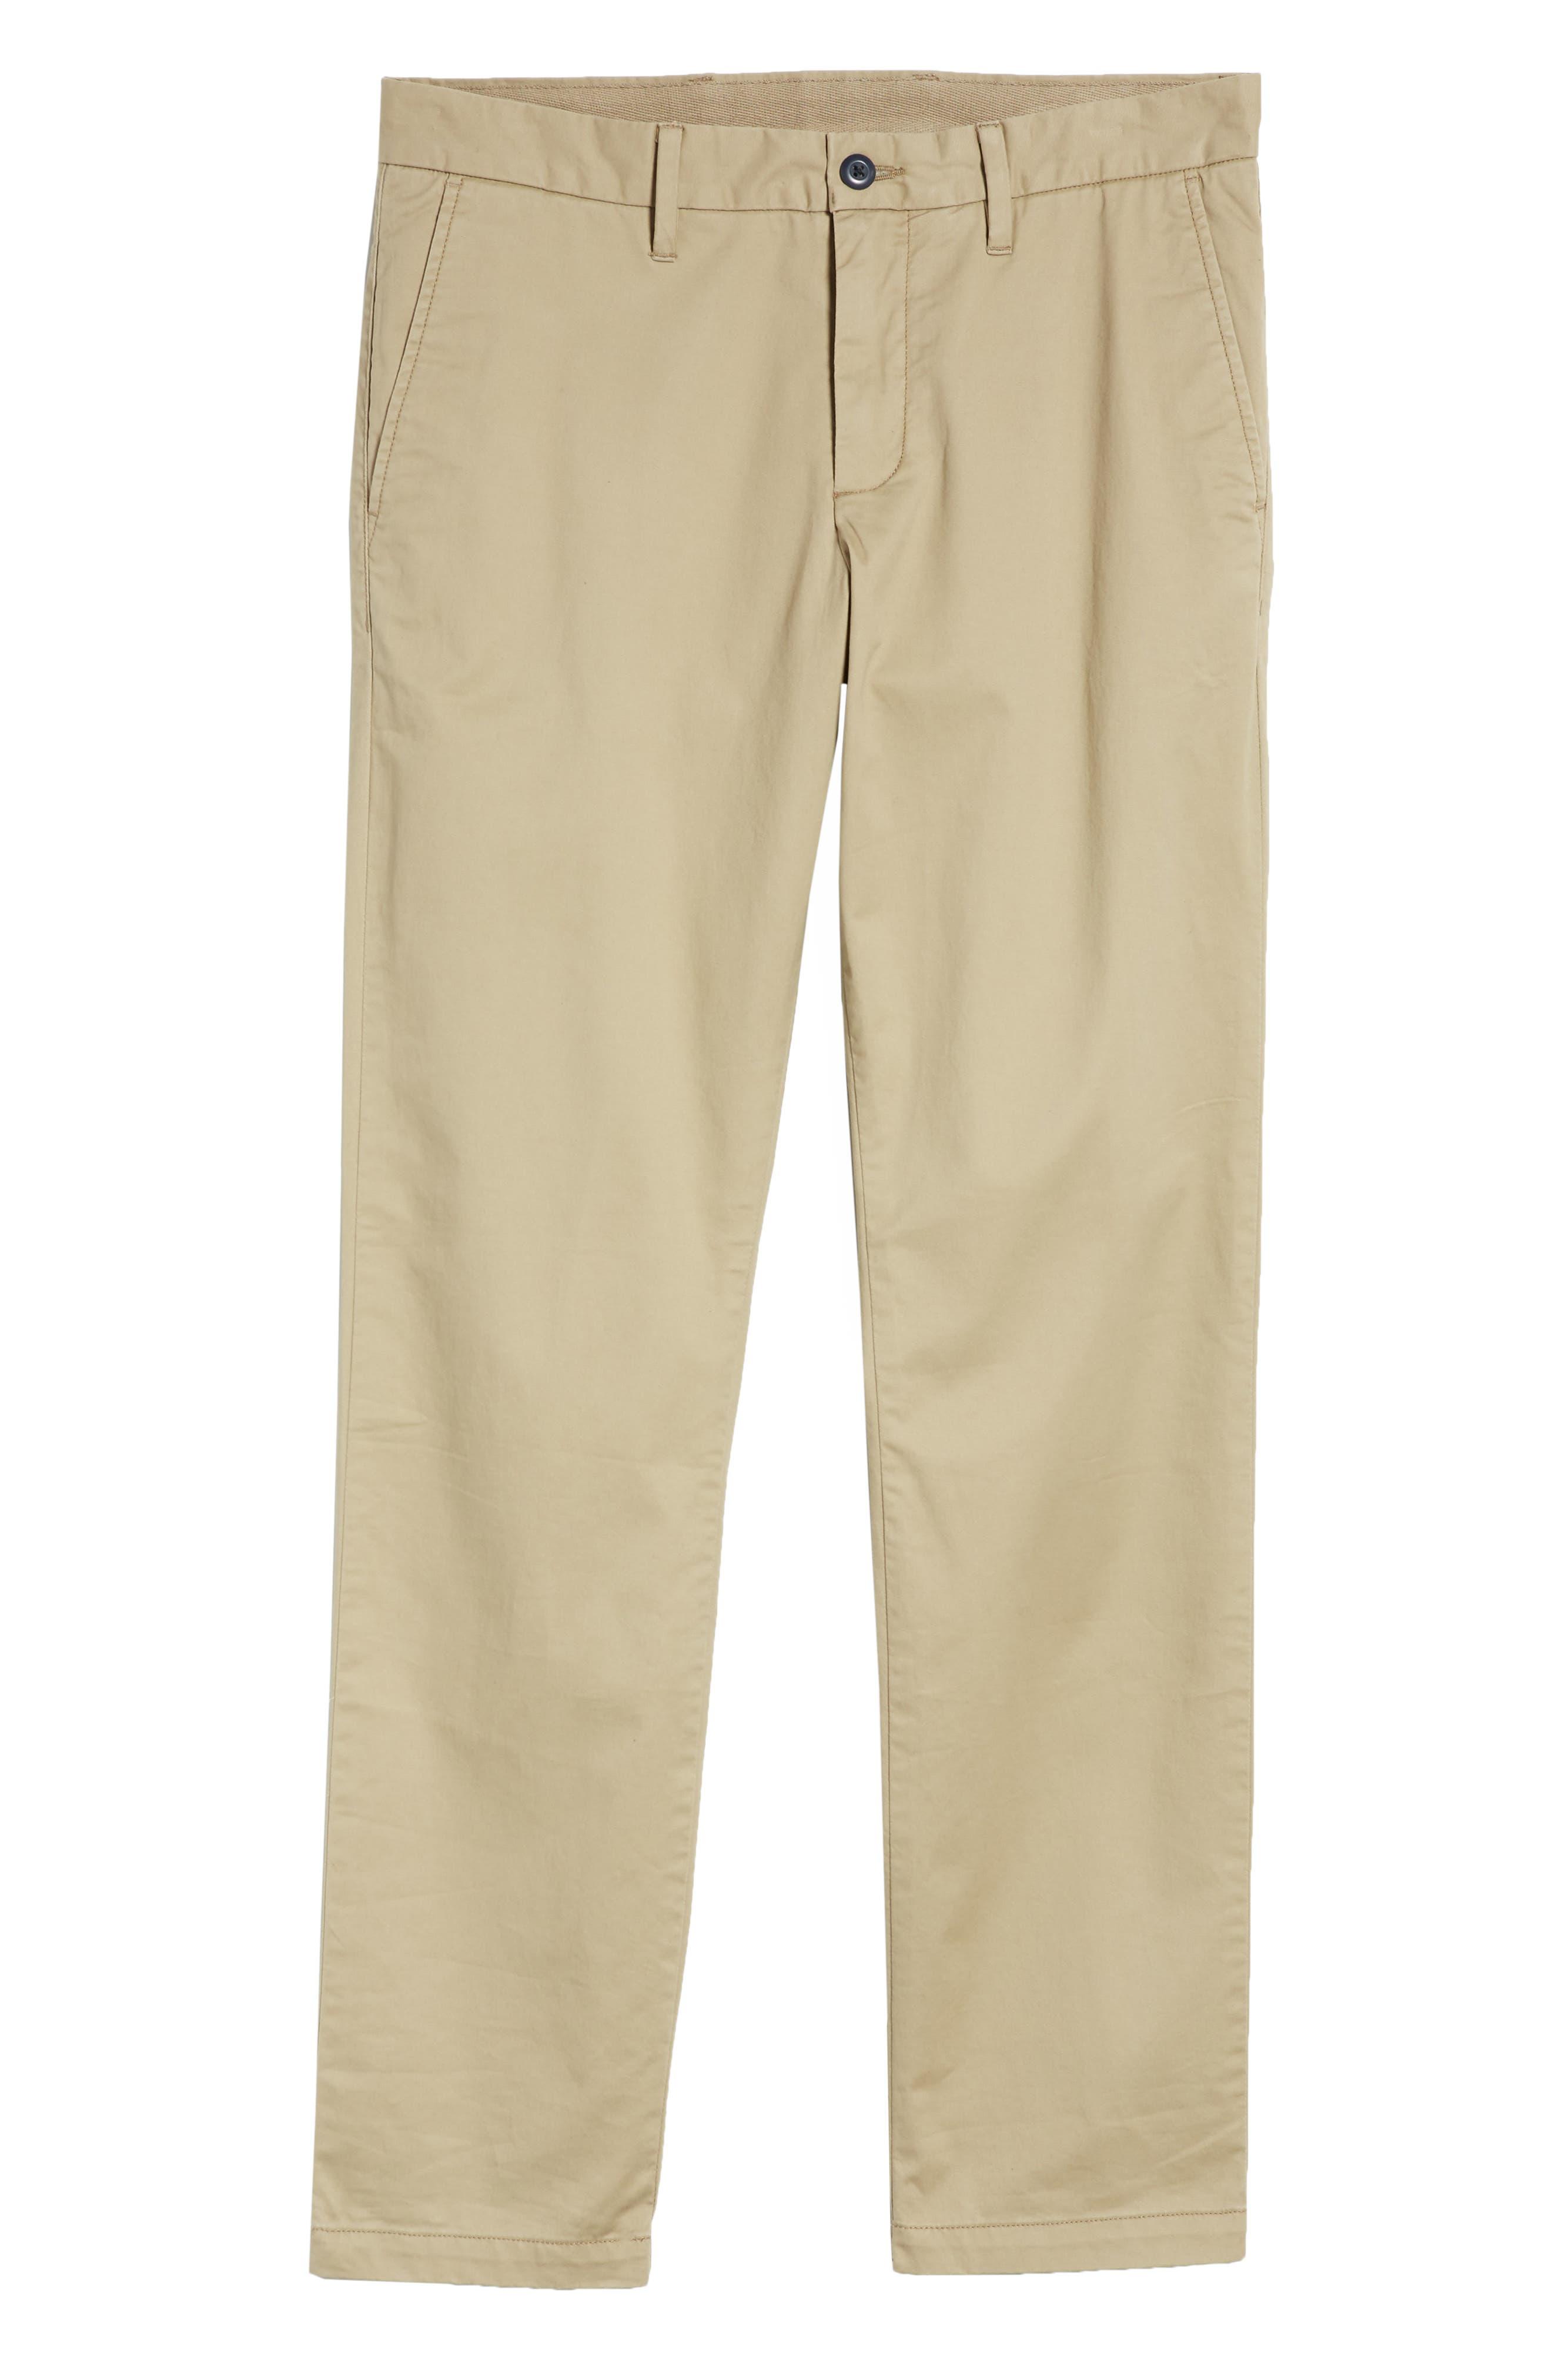 Ballard Slim Fit Stretch Chino Pants,                             Alternate thumbnail 6, color,                             Tan Burrow